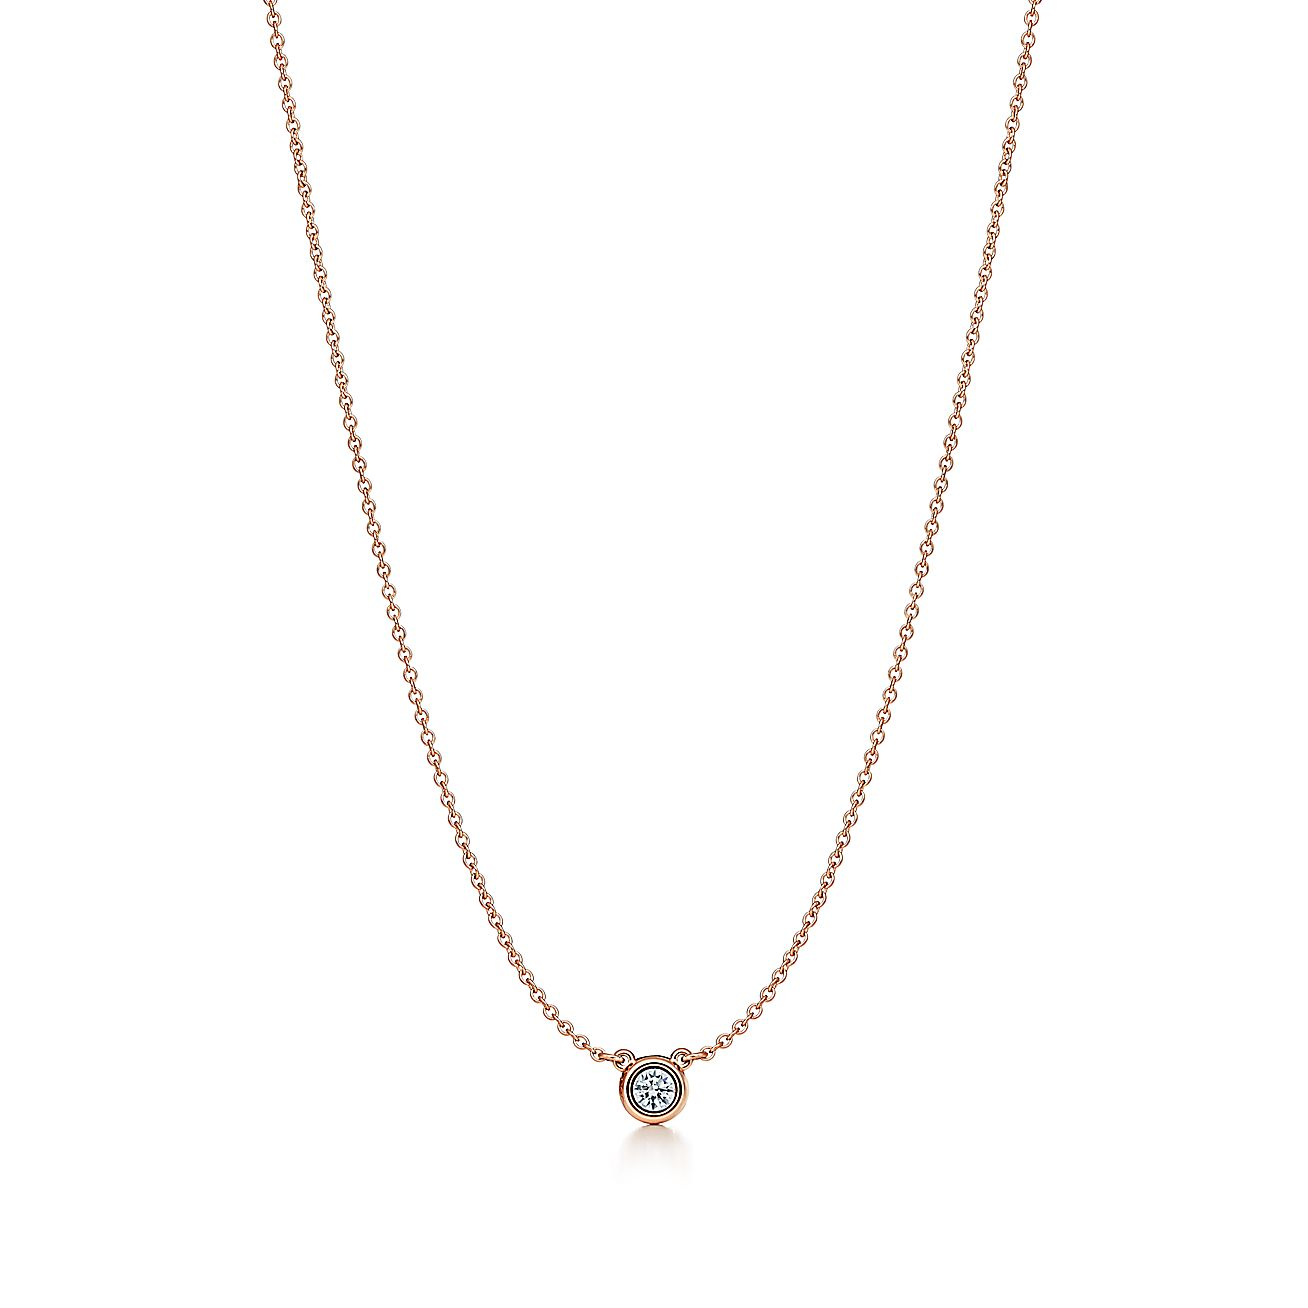 Elsa peretti diamonds by the yard pendant in 18k rose for Diamonds by the yard ring